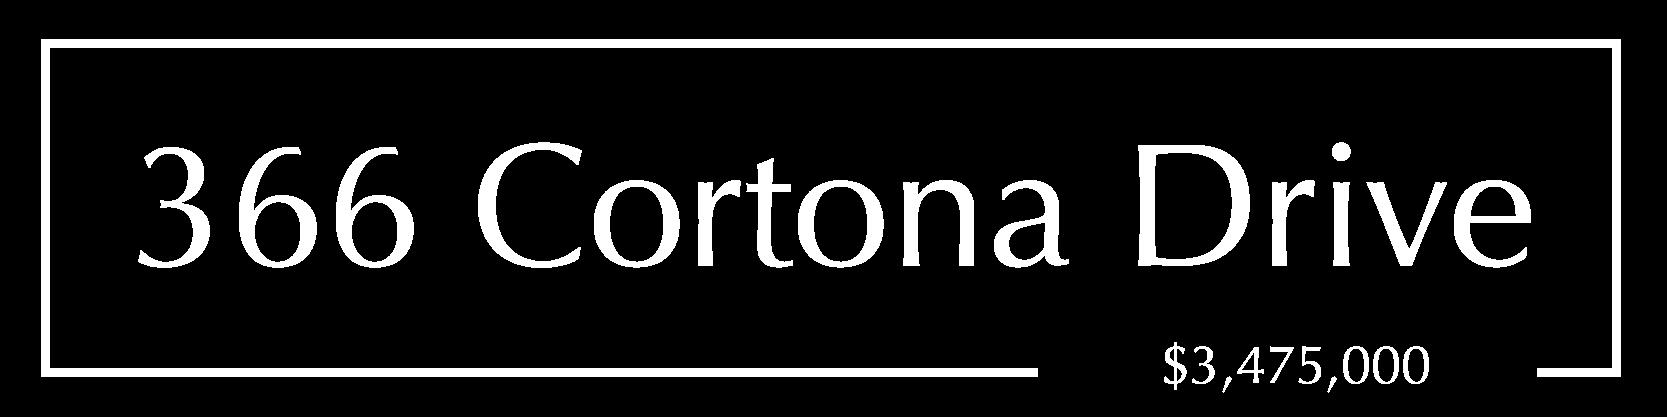 Microsite logo 366 cortona.png?ixlib=rb 3.2